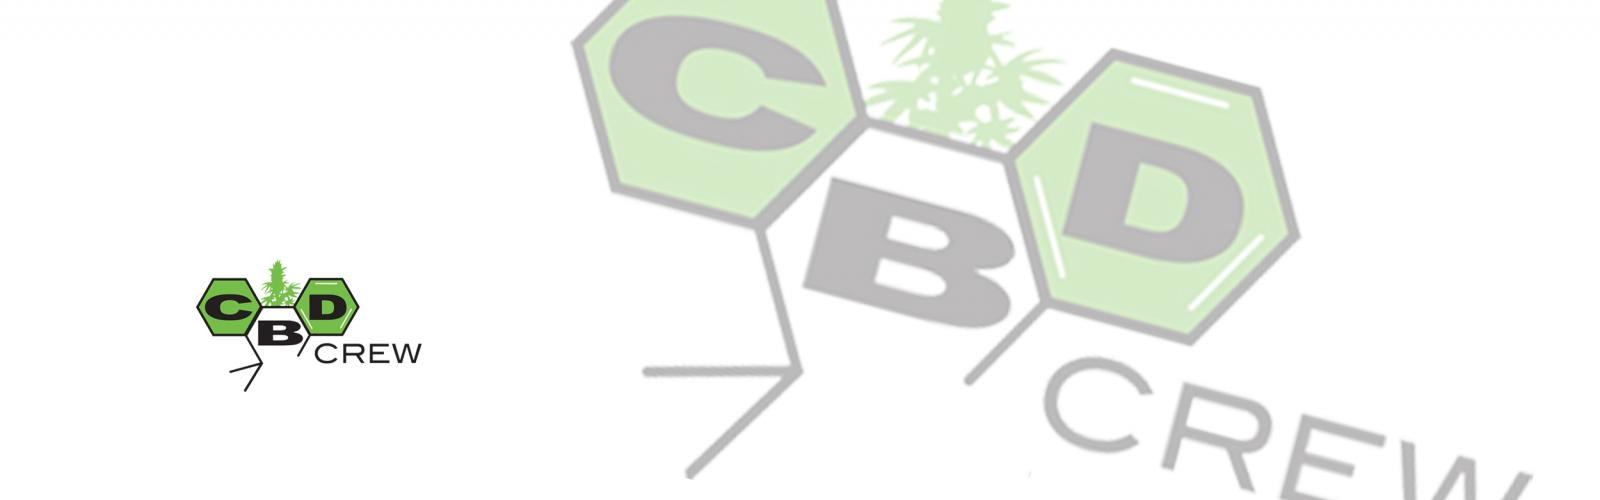 Semillas de Marihuana CBD Crew